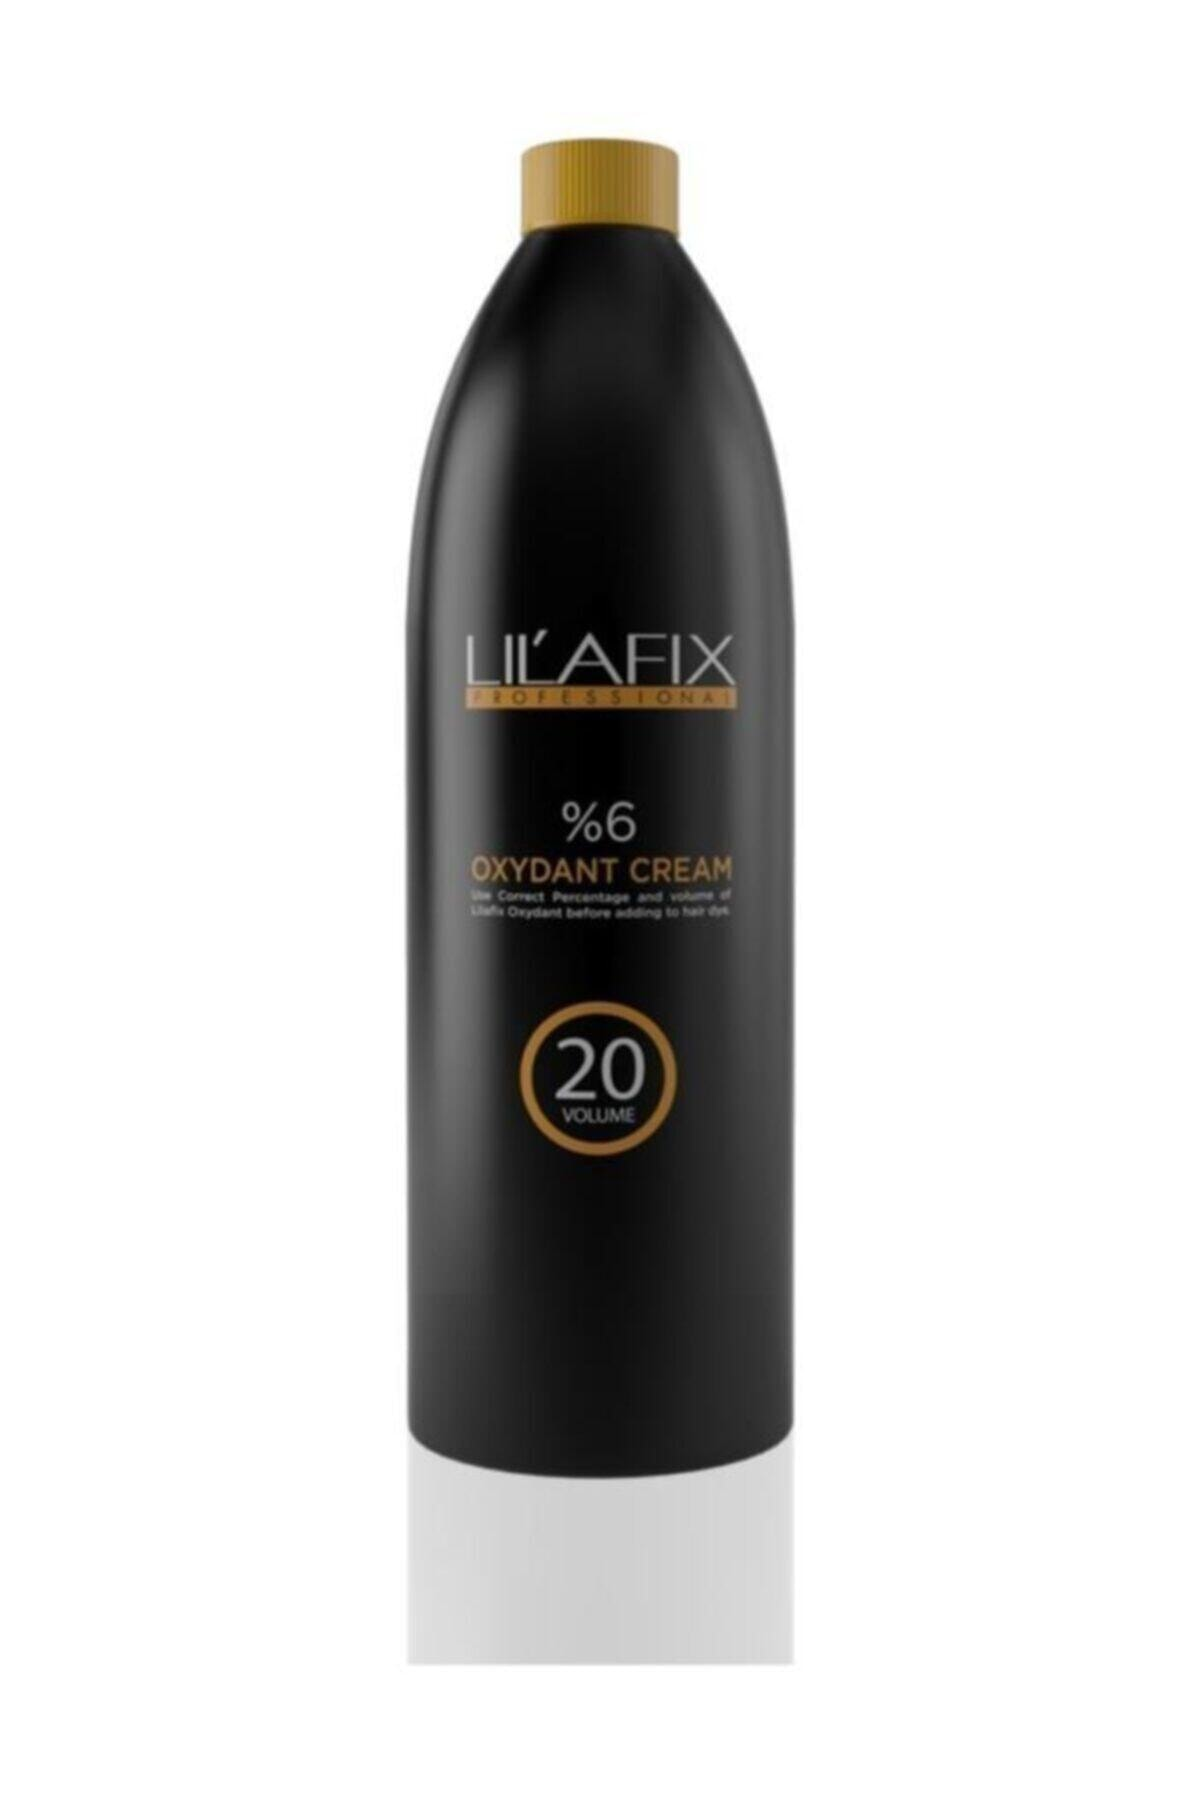 Lilafix 20 Volume (%6) Oksidan Krem 1000 ml 1